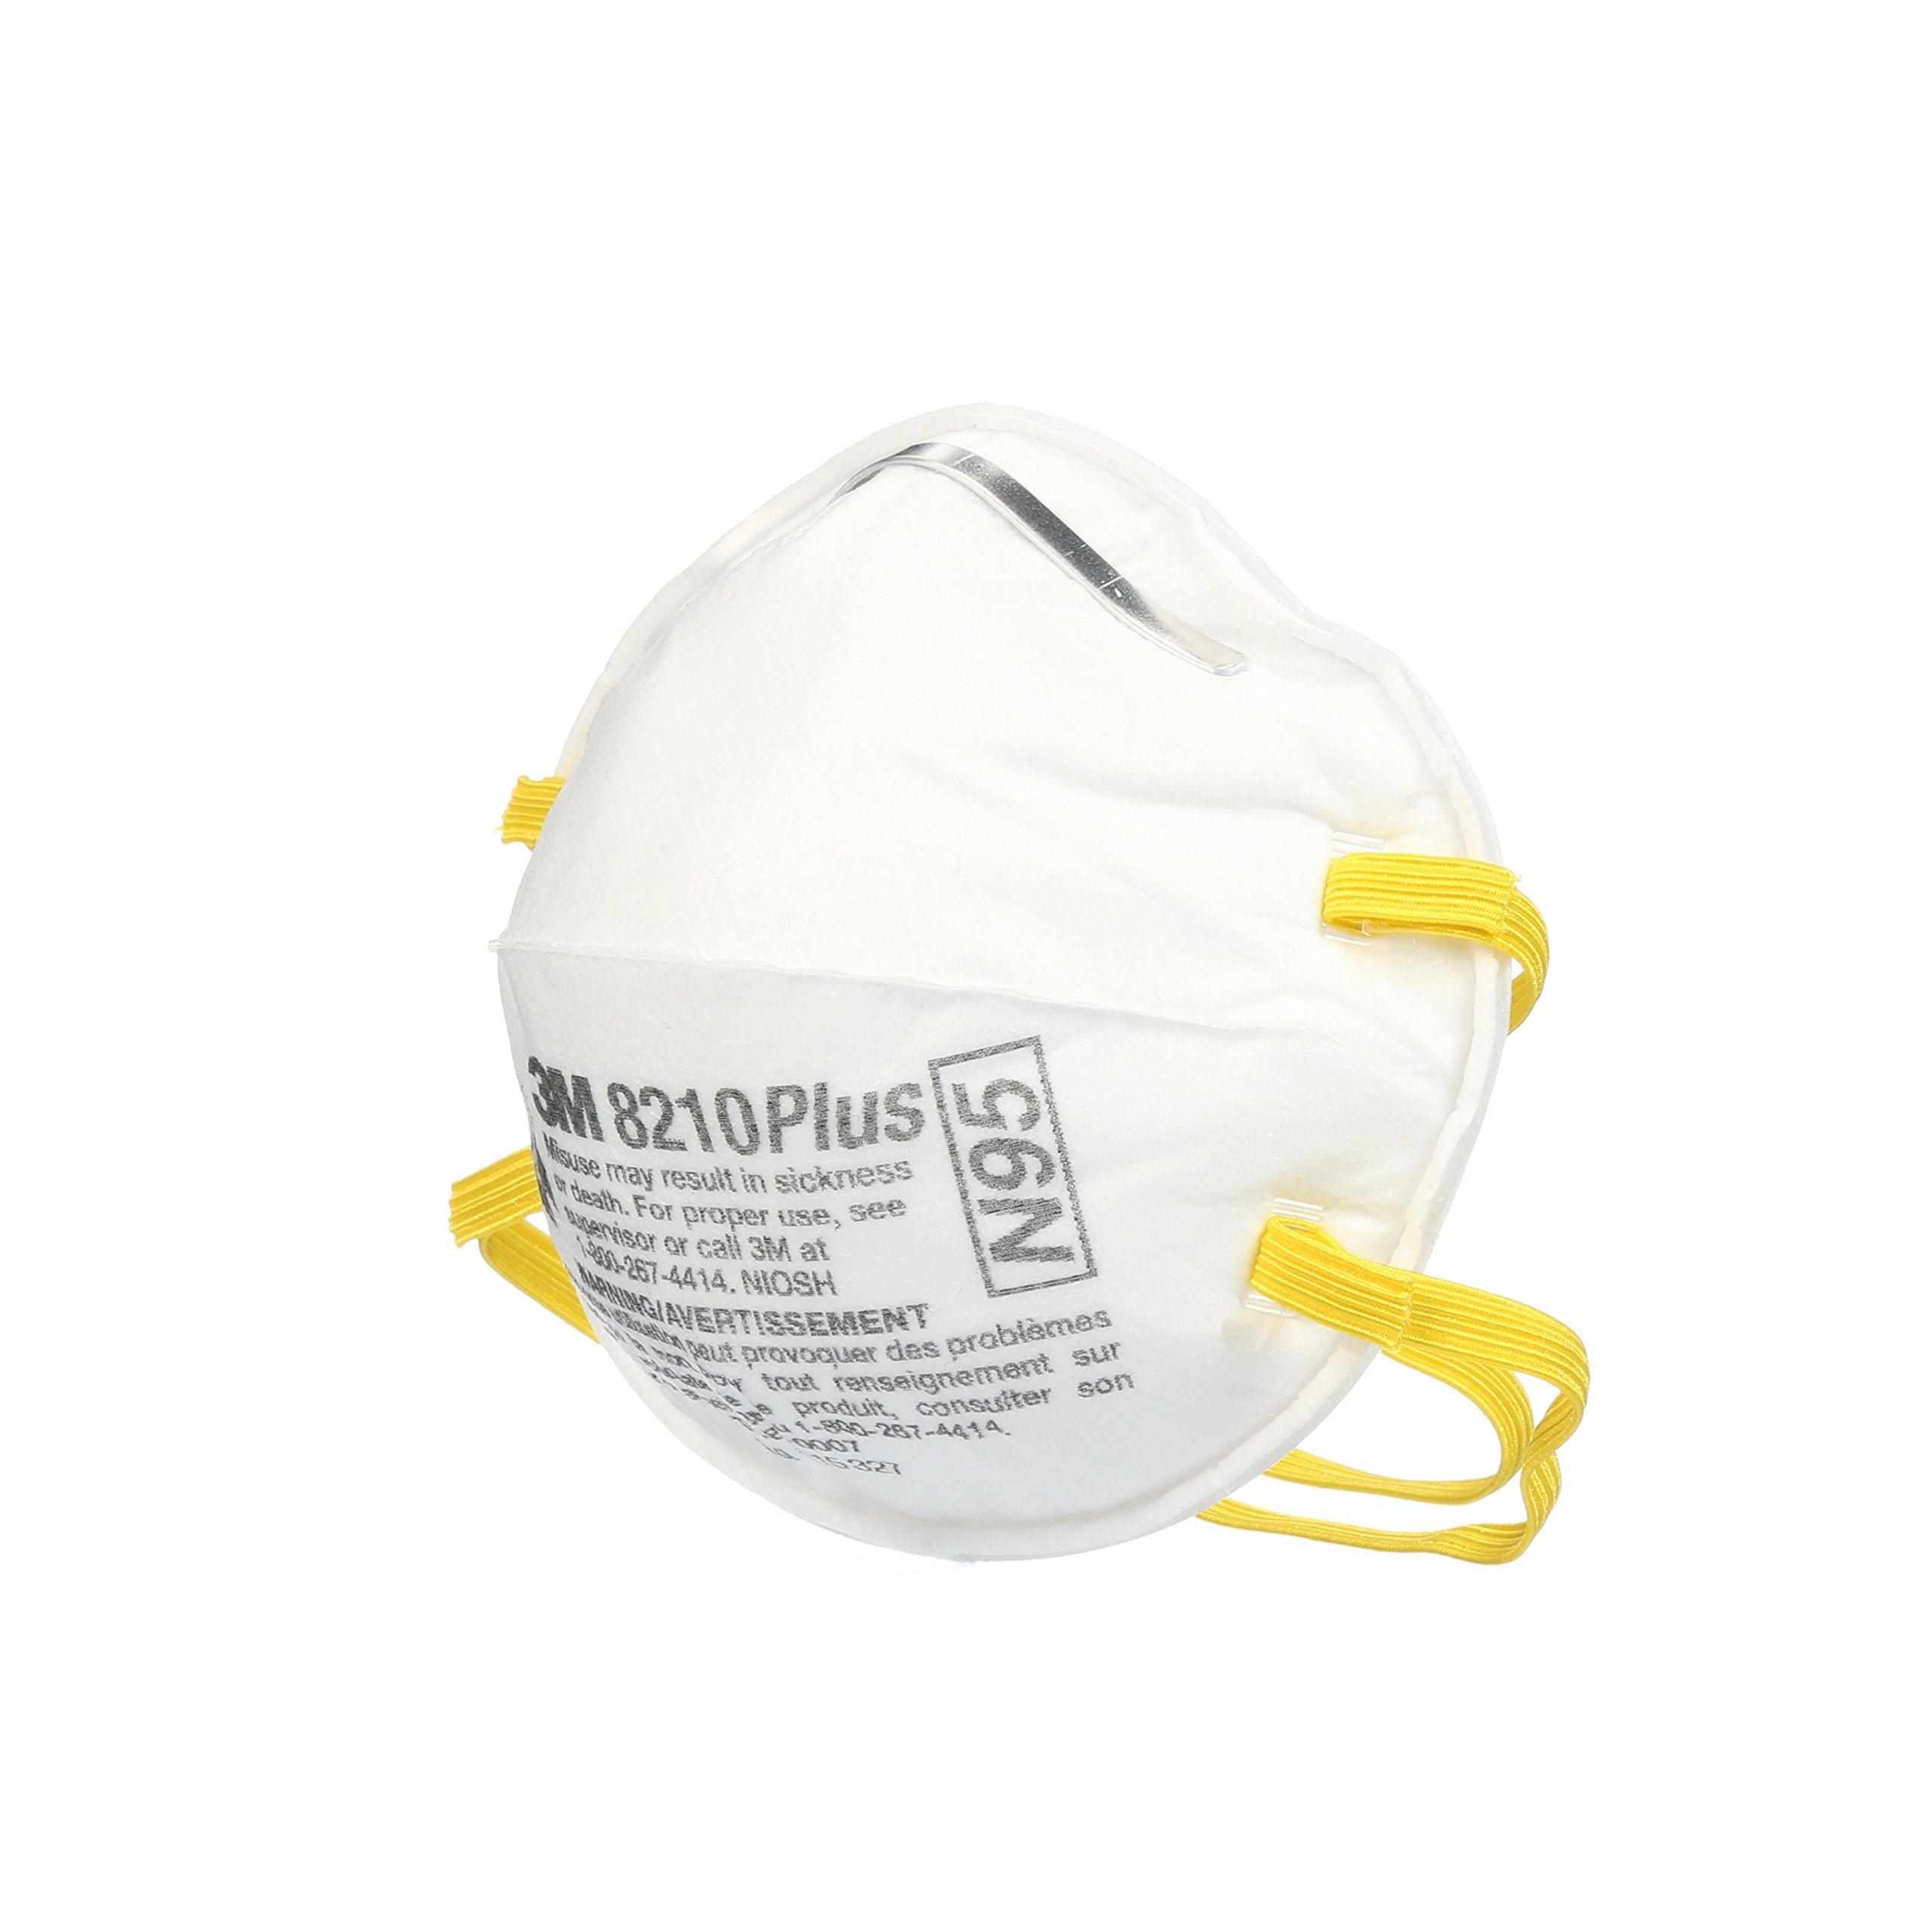 3M 8210 Plus Paint Sanding Dust Particulate Respirators, N95, 20-Pack by 3M (Image #4)